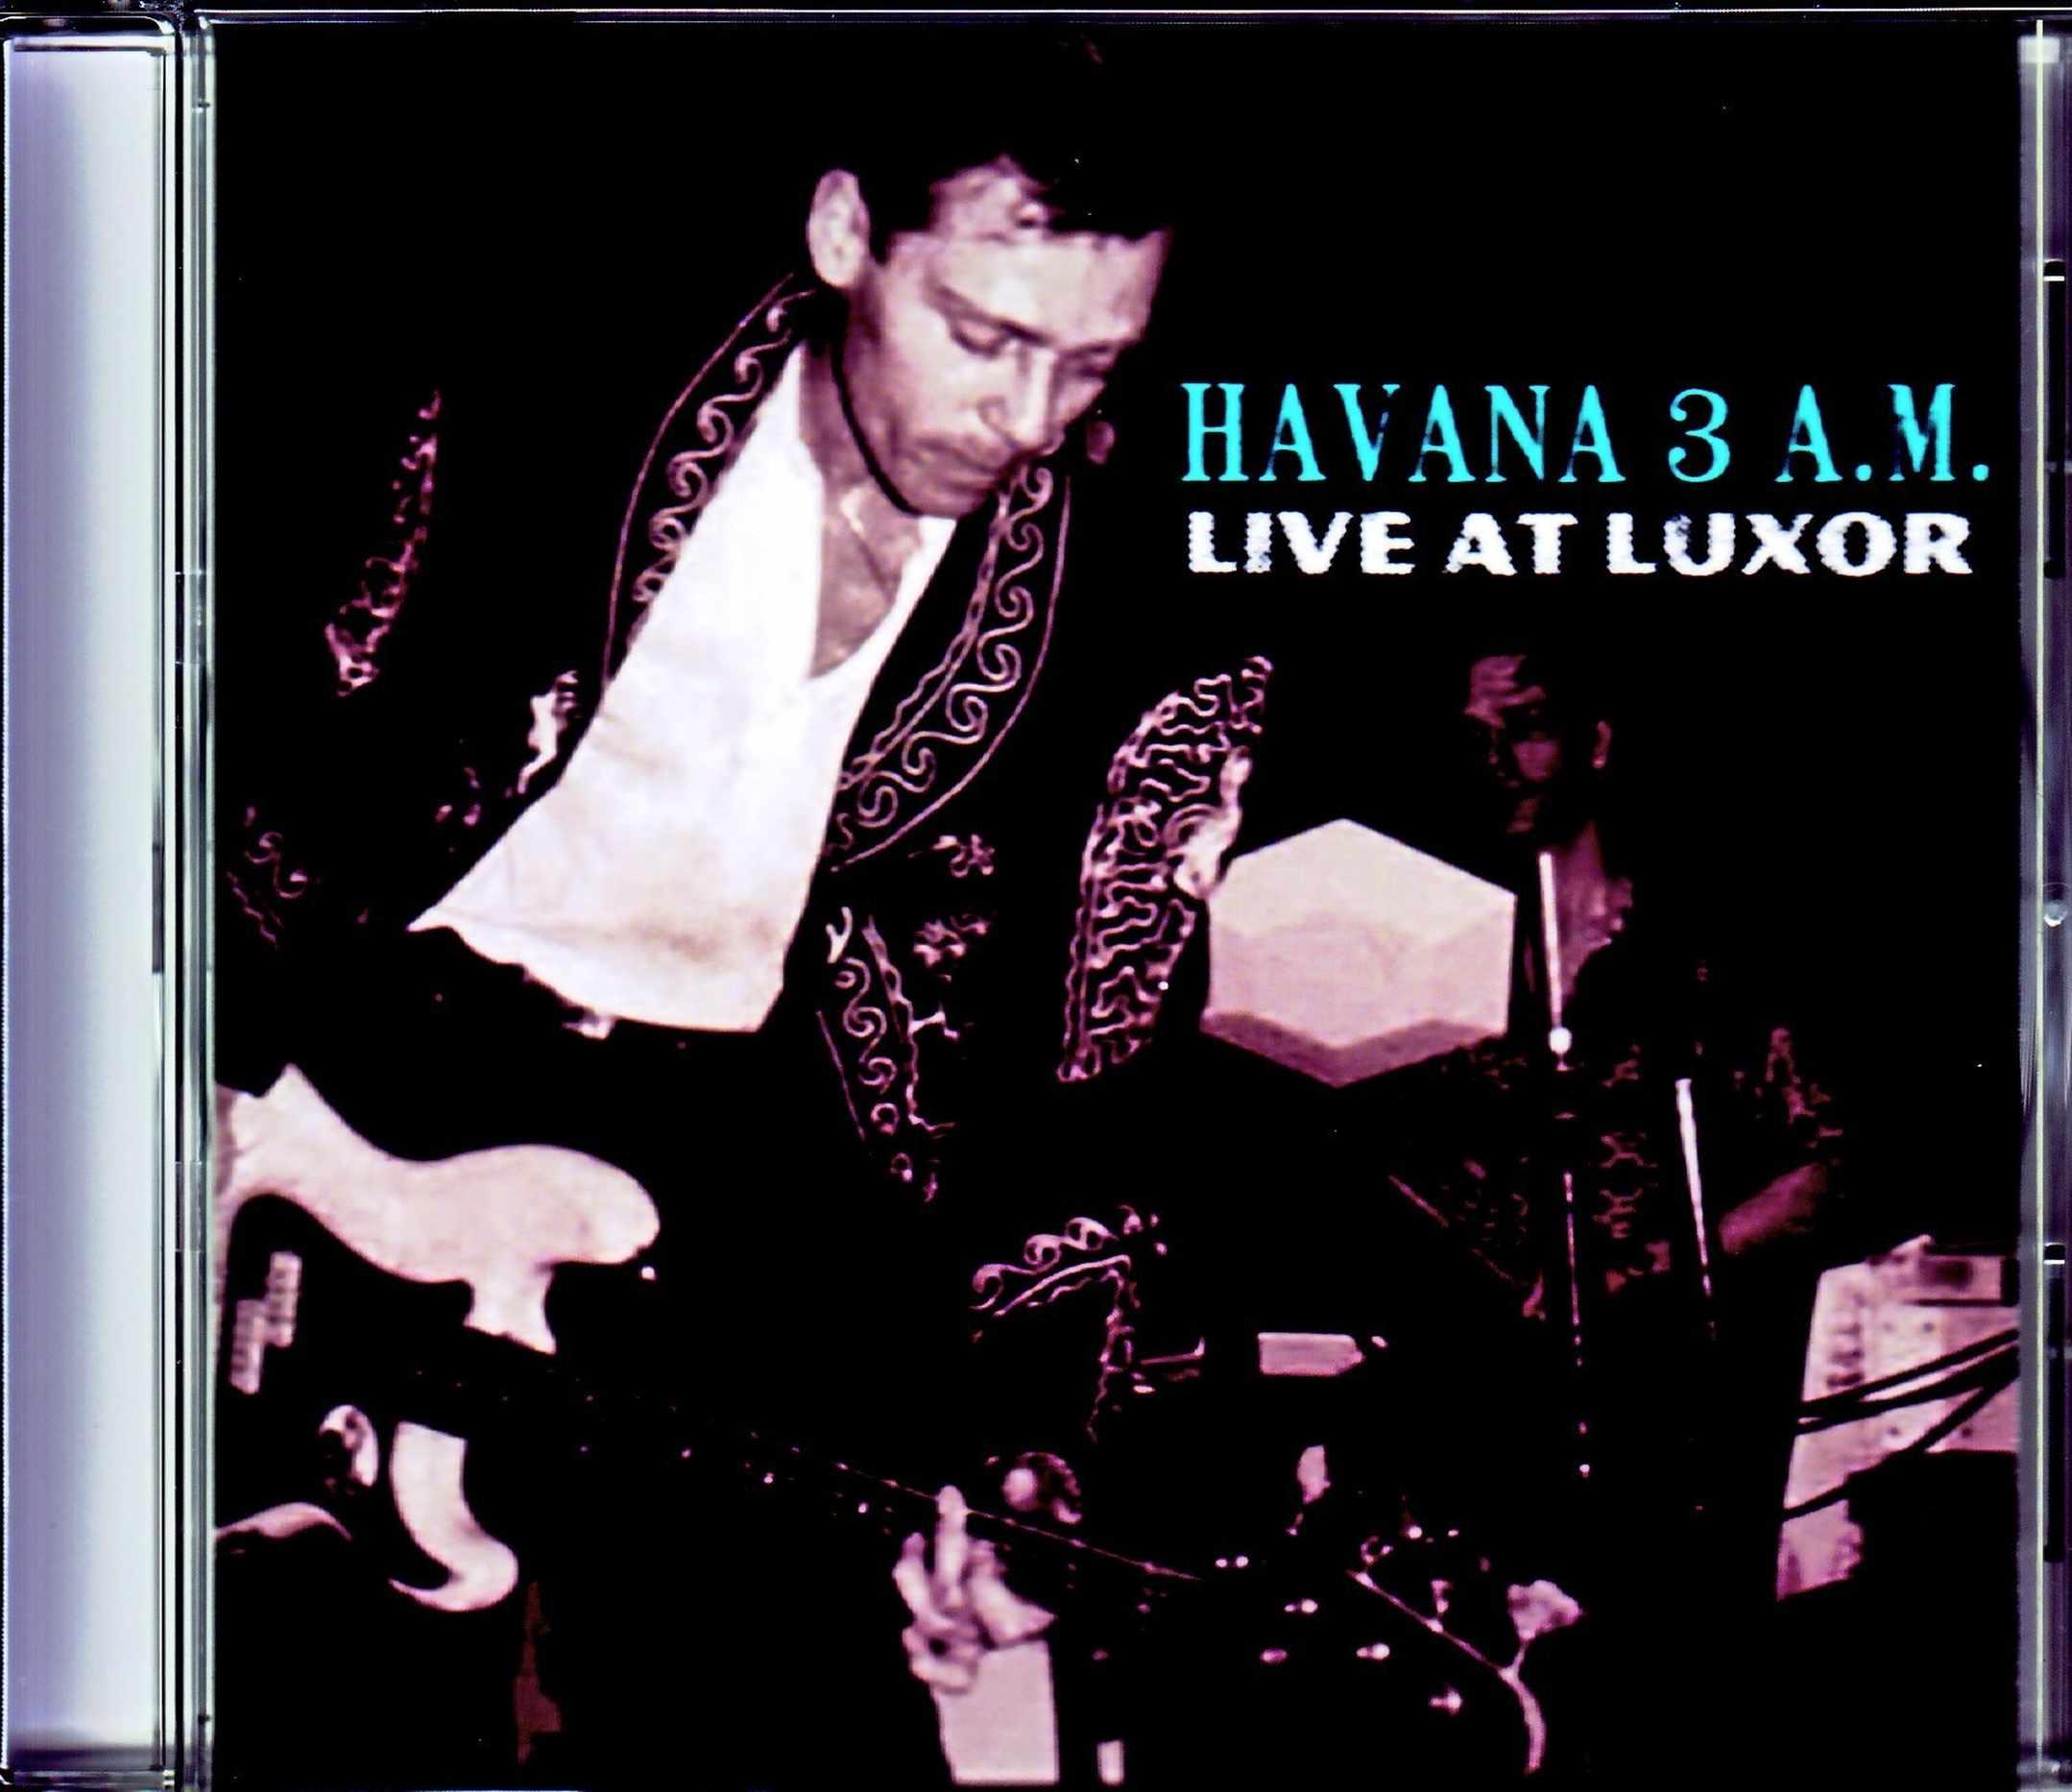 Havana 3 A.M. ハバナ 3 A.M./Germany 1991